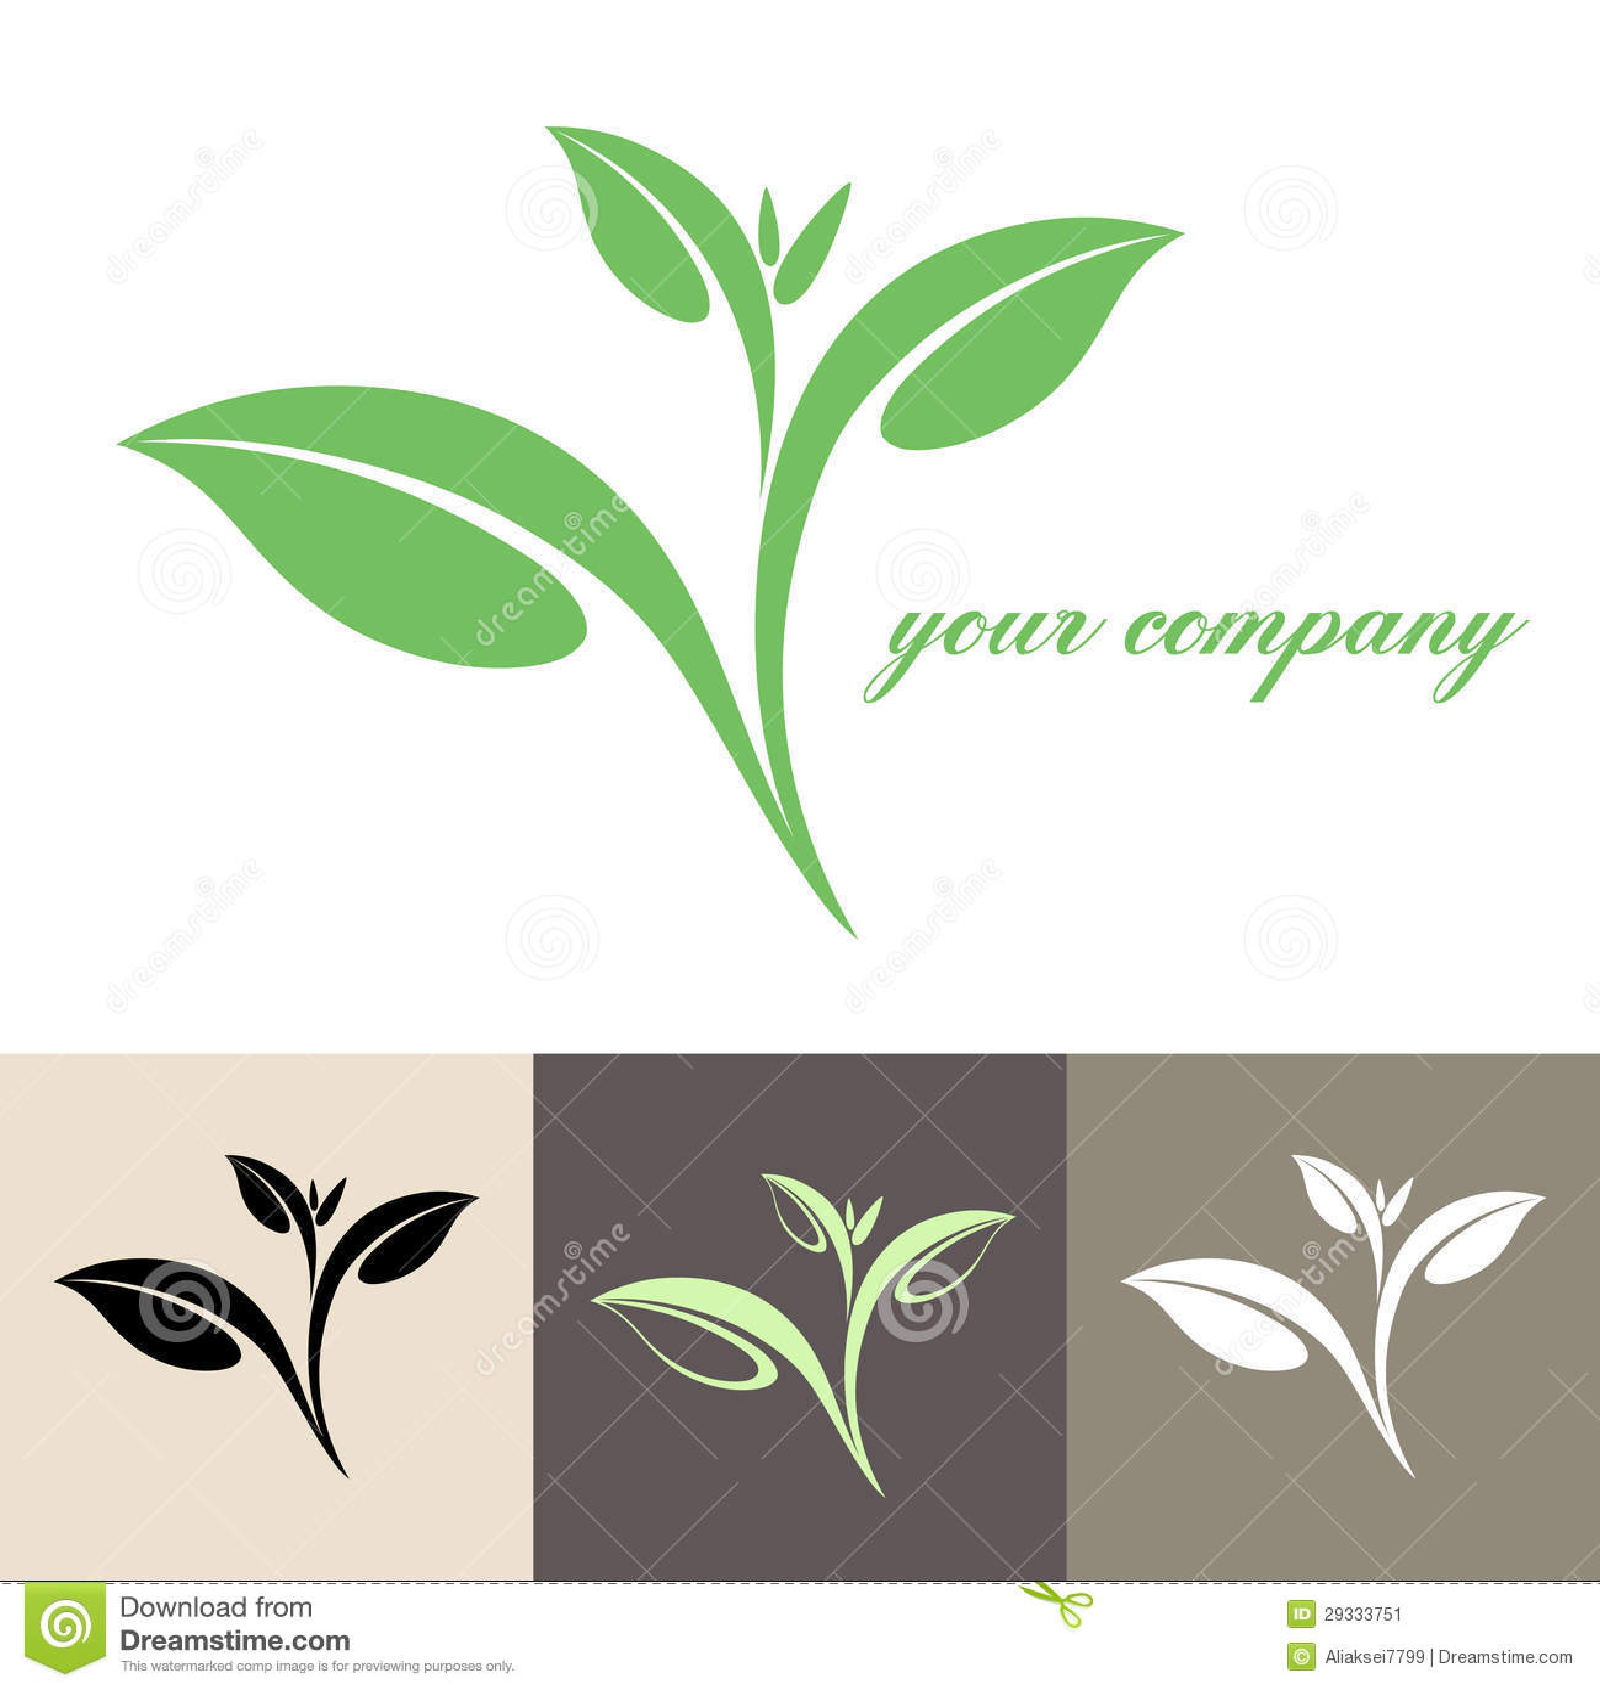 Tea. Logo. Vector illustration (EPS 10) + alternate file (CDR 10).